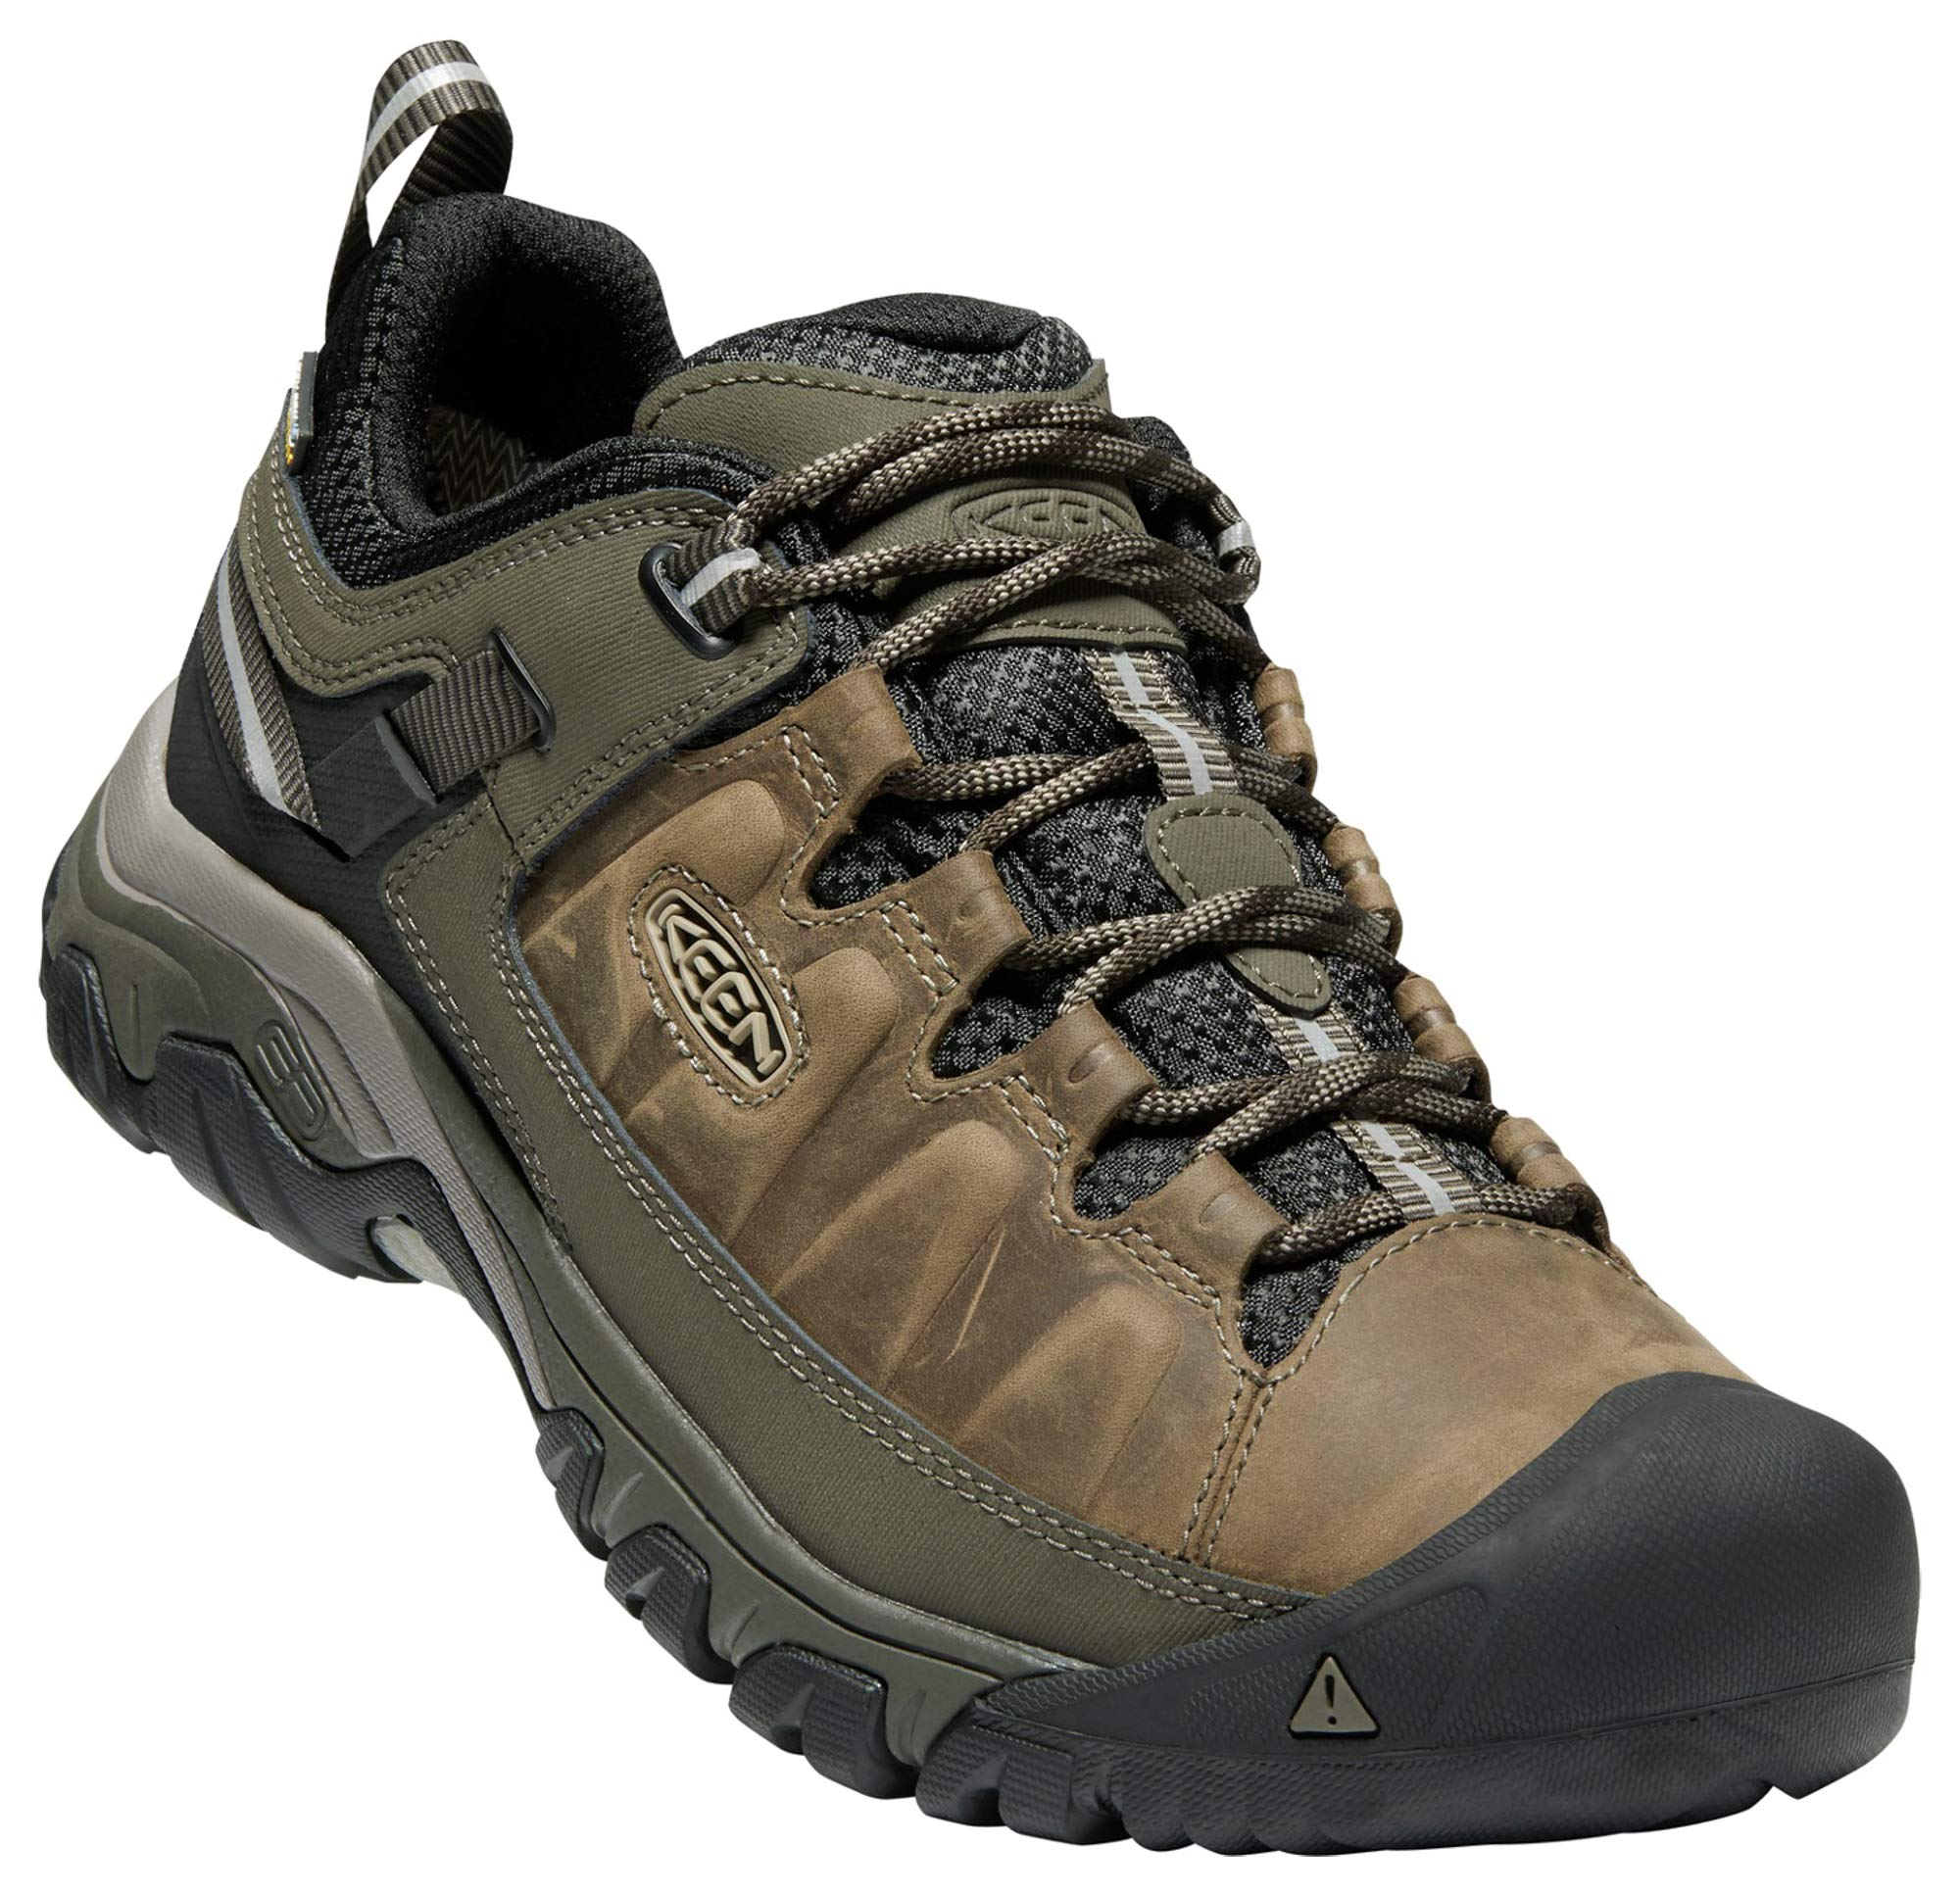 KEEN Men's Targhee iii Leather wp-m Hiking Shoe, Bungee Cord/Black, 12 M US by KEEN